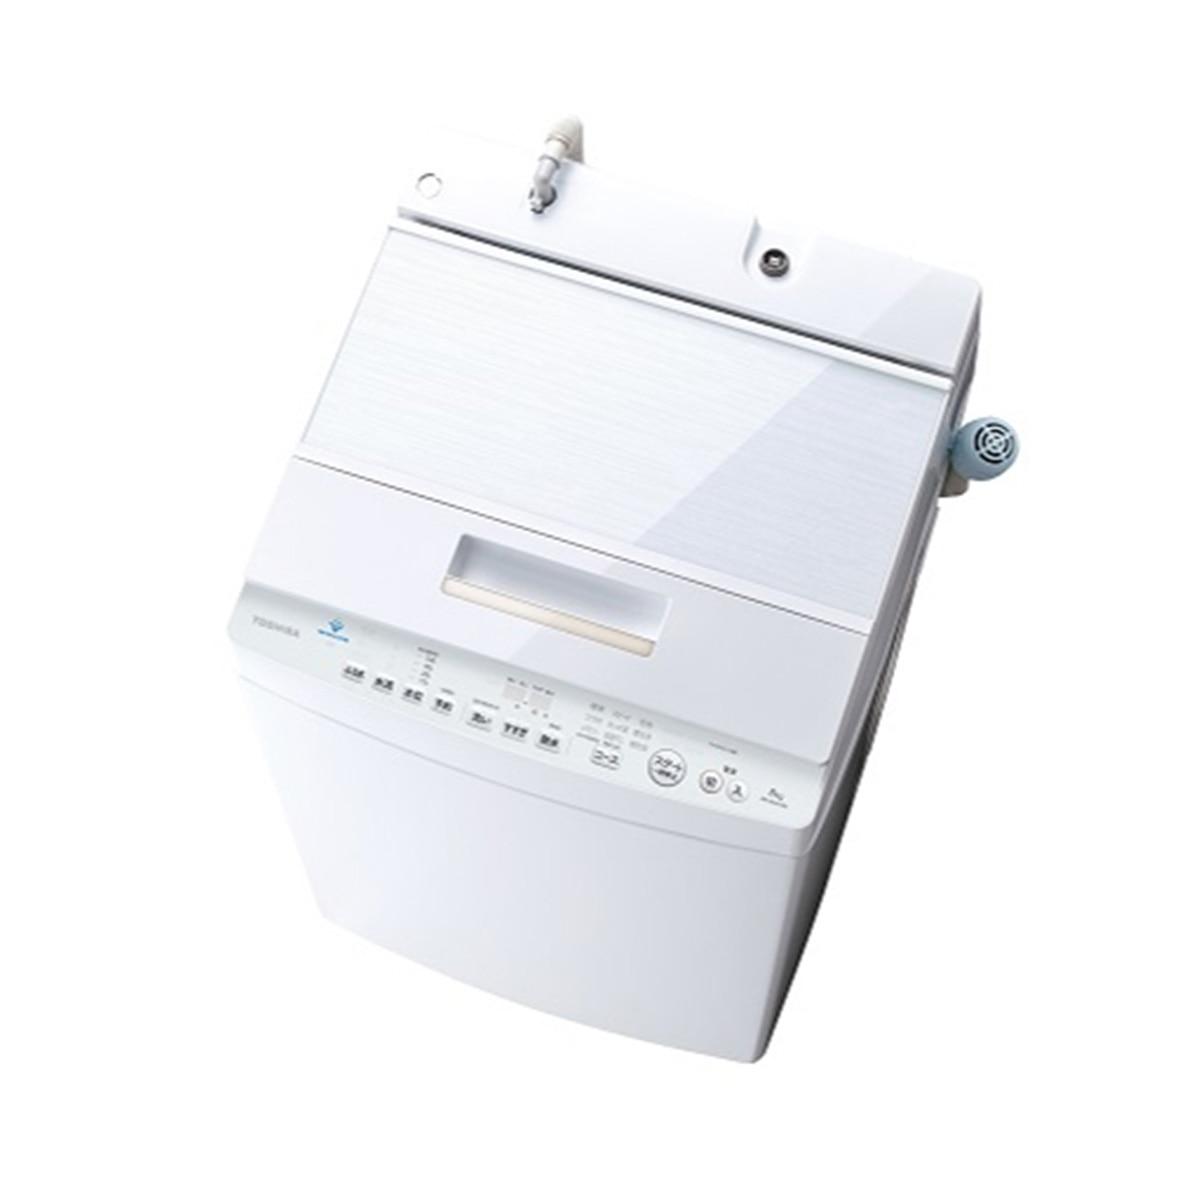 TOSHIBA 全自動洗濯機 8kg ZABOON 抗菌ウルトラファインバブル洗浄 グランホワイト【大型商品(設置工事可)】 AW-8DH1W